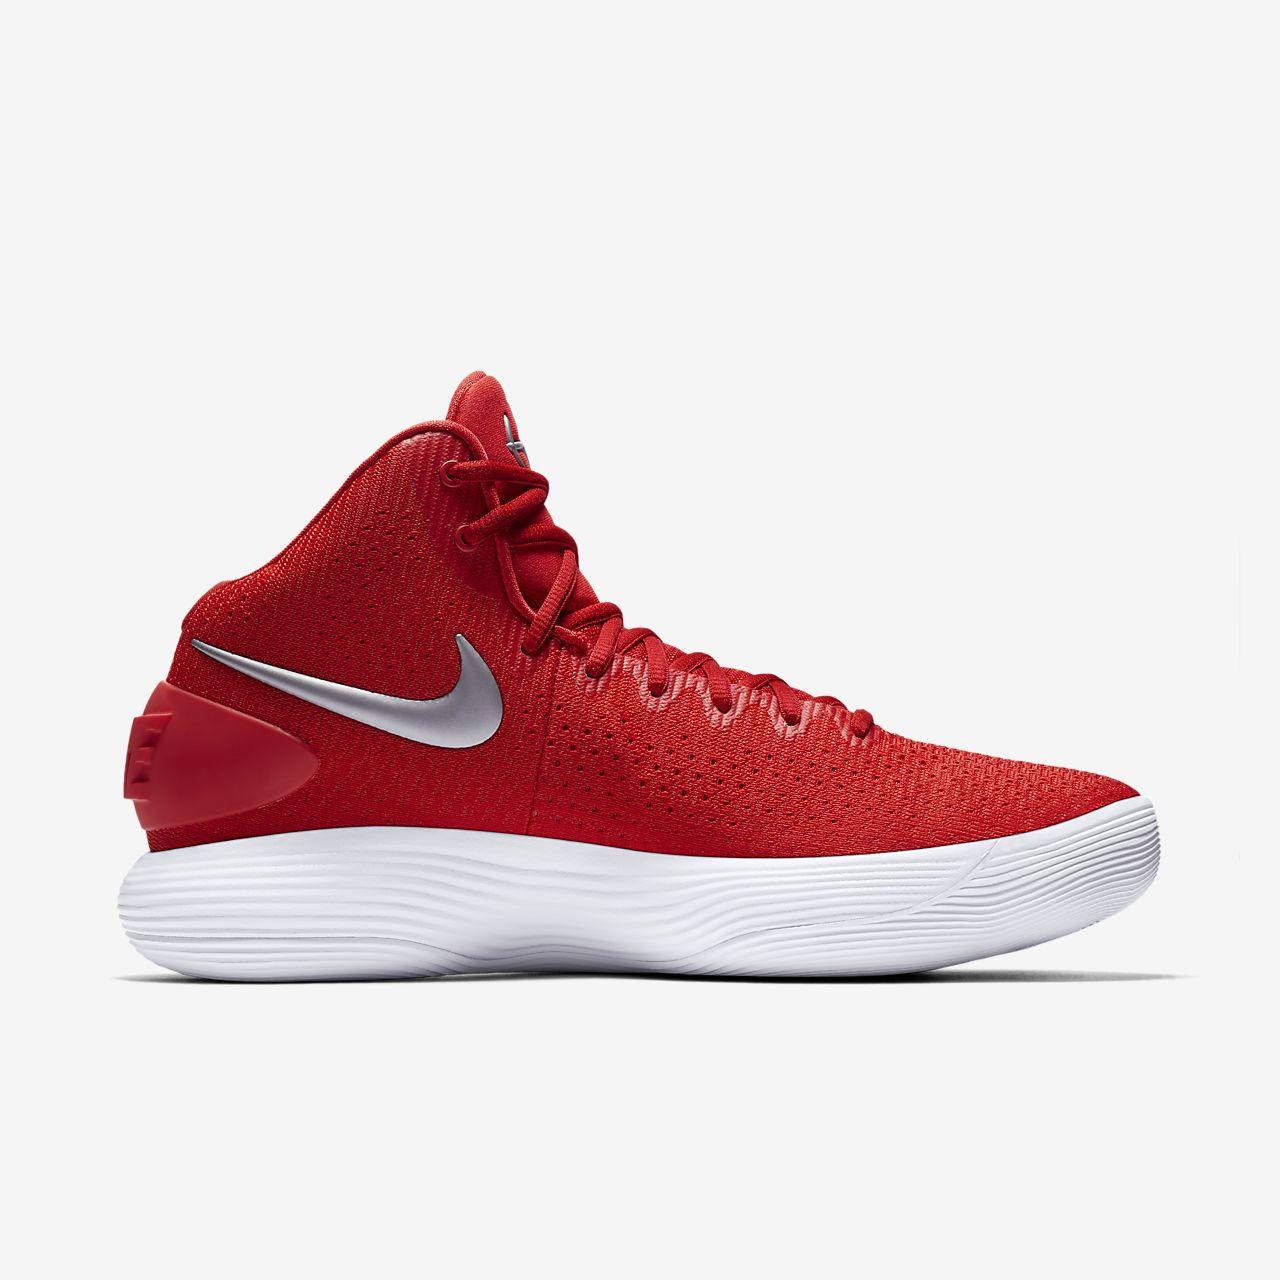 nike youth basketball shoes hyperdunk